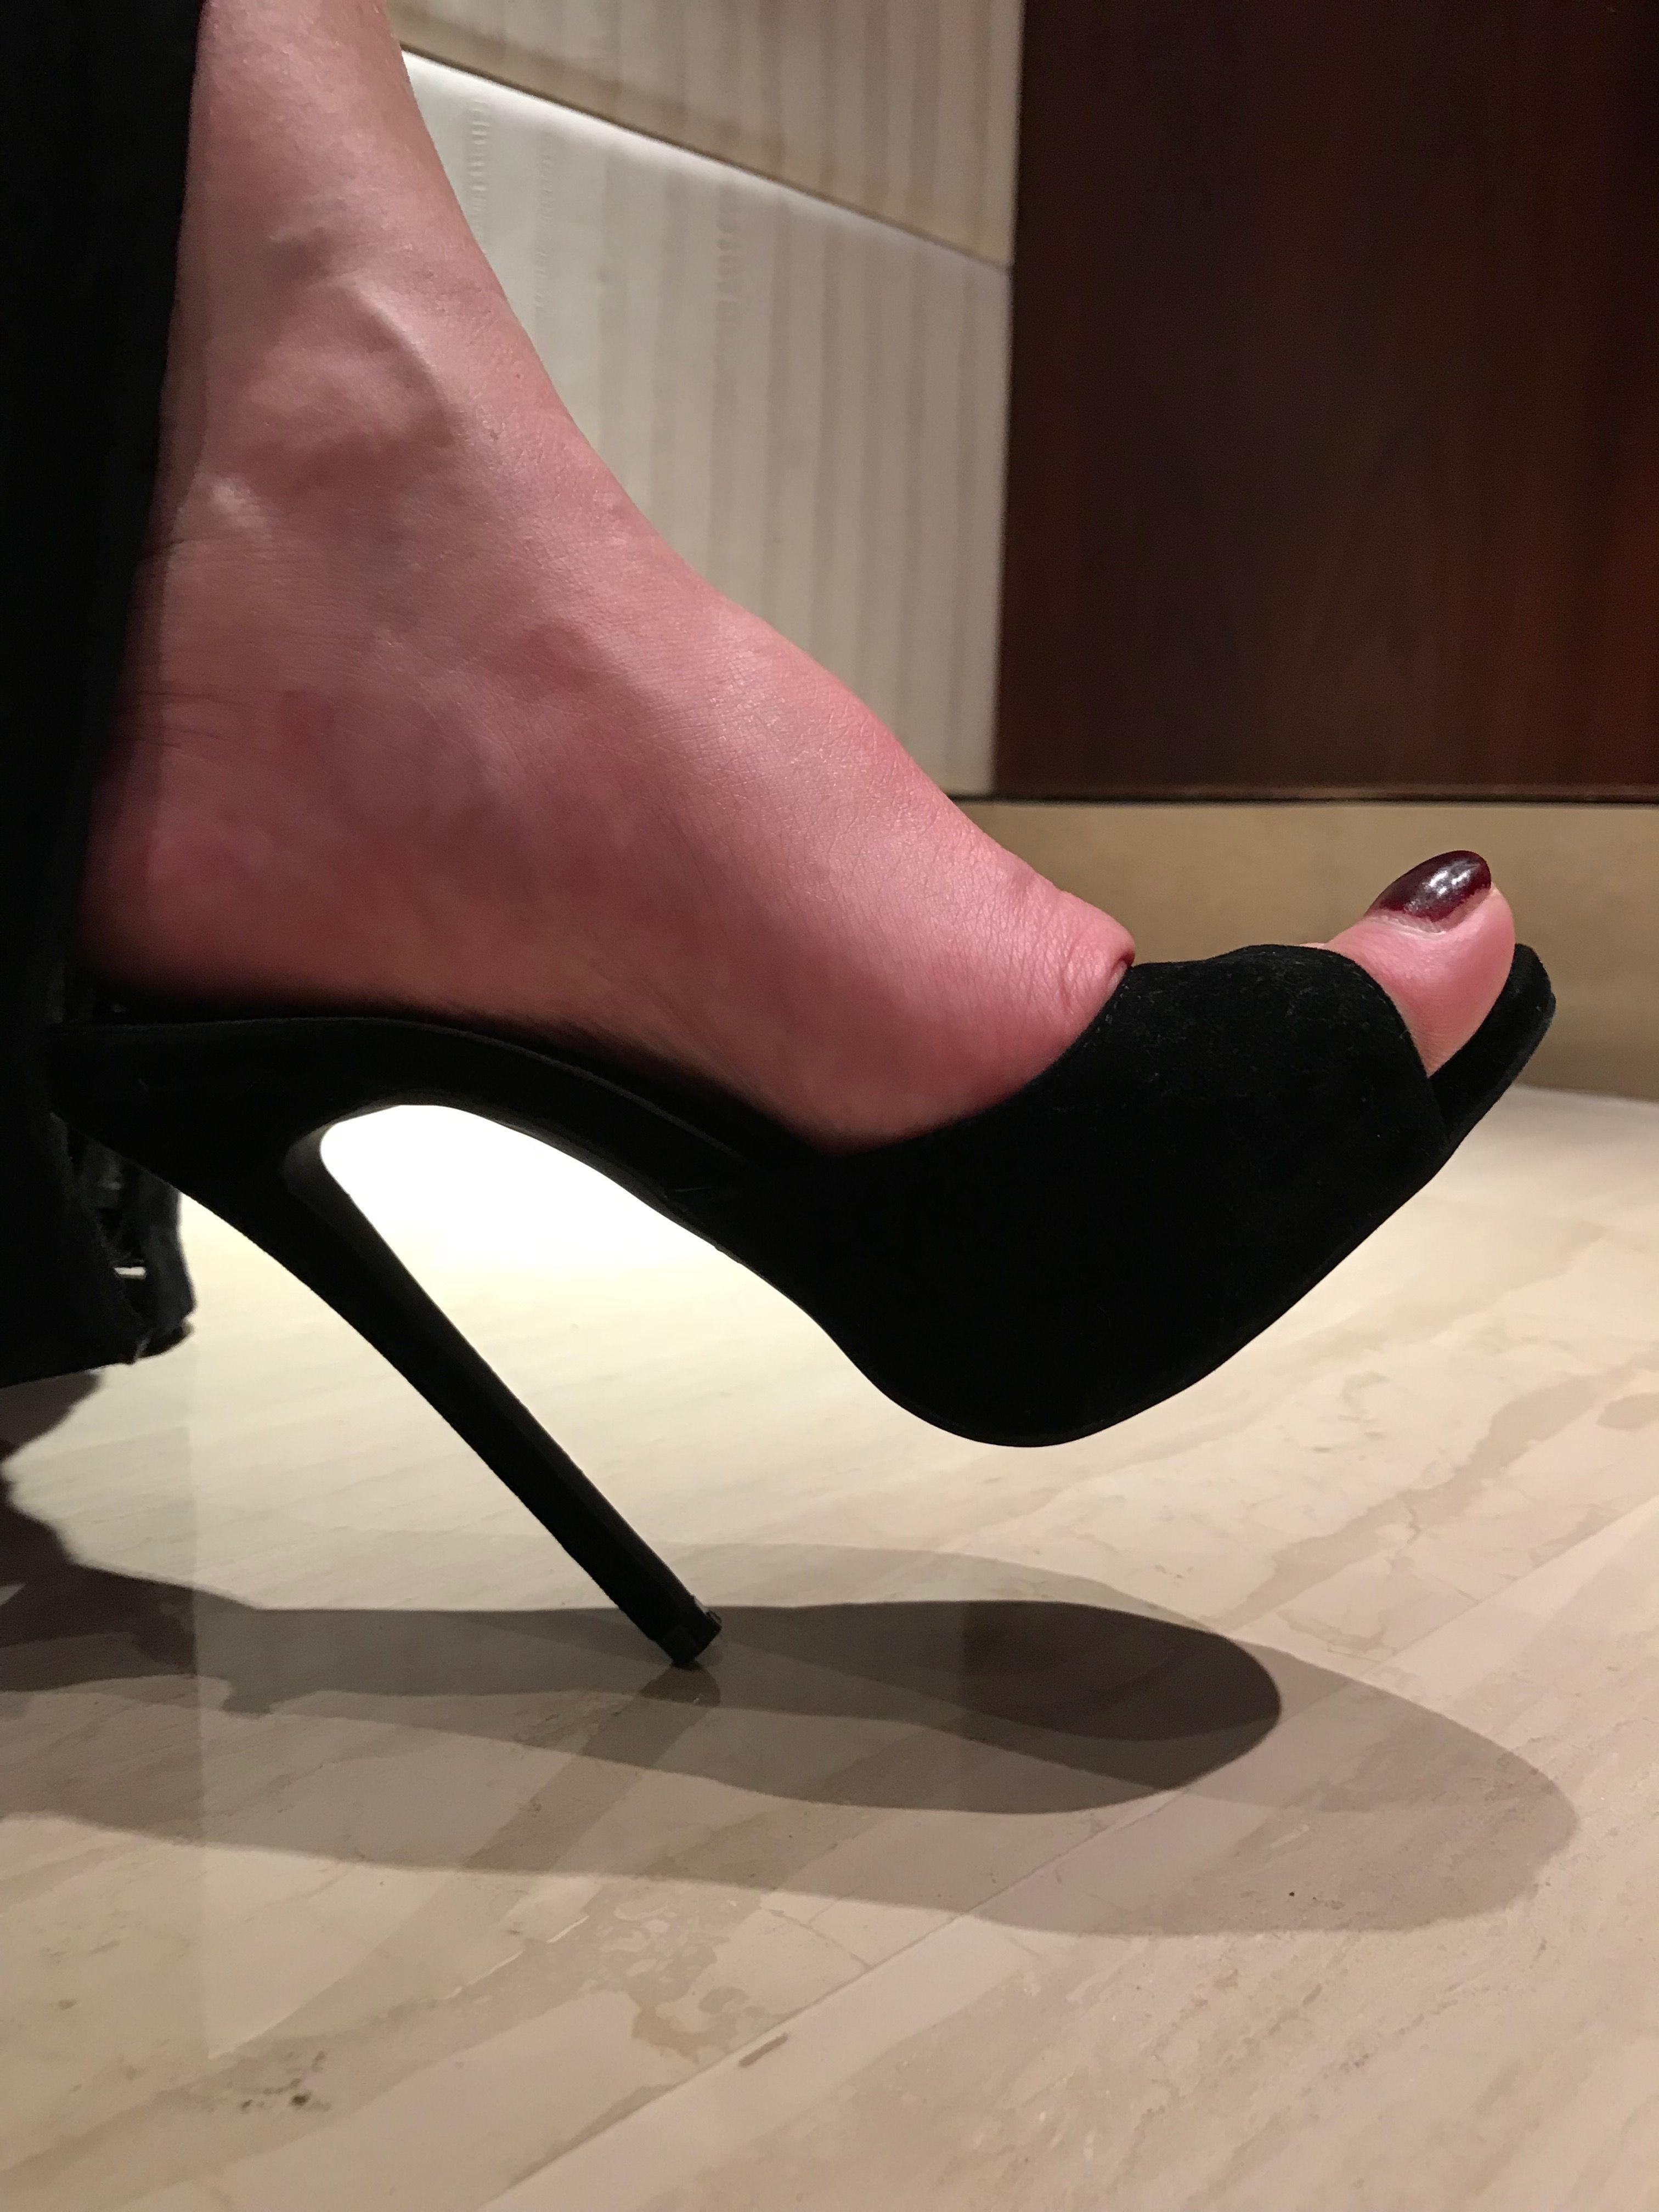 9a3a78f3d2 Bebo mules | Mules | Shoes, Heels, High heels